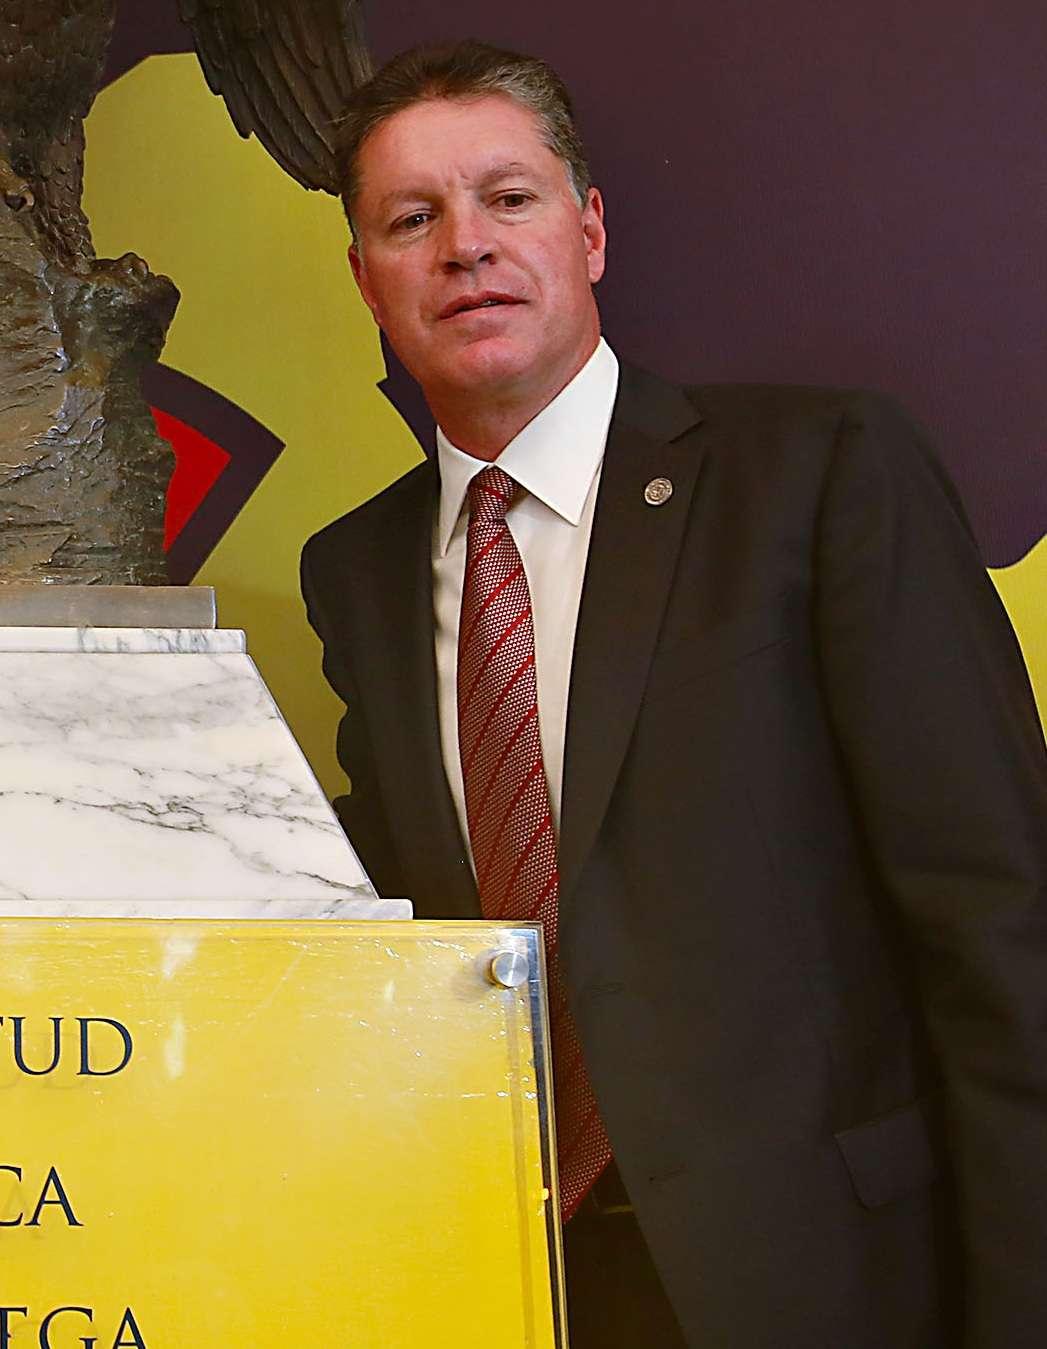 Ricardo Peláez, presidente deportivo del América. Foto: Imago7